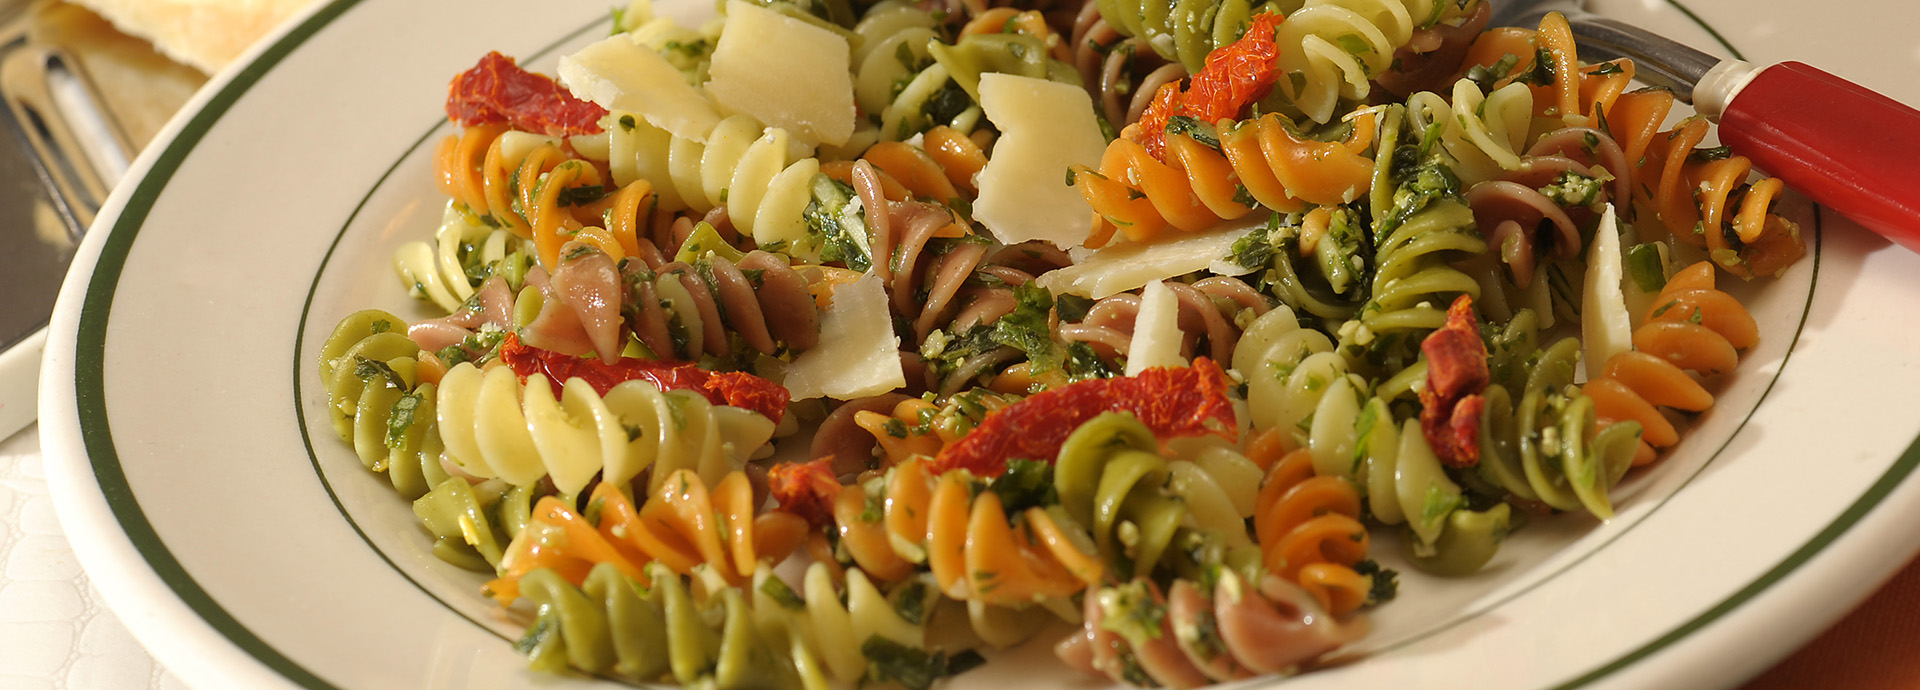 Wacky Mac® - Garden Fresh Pesto